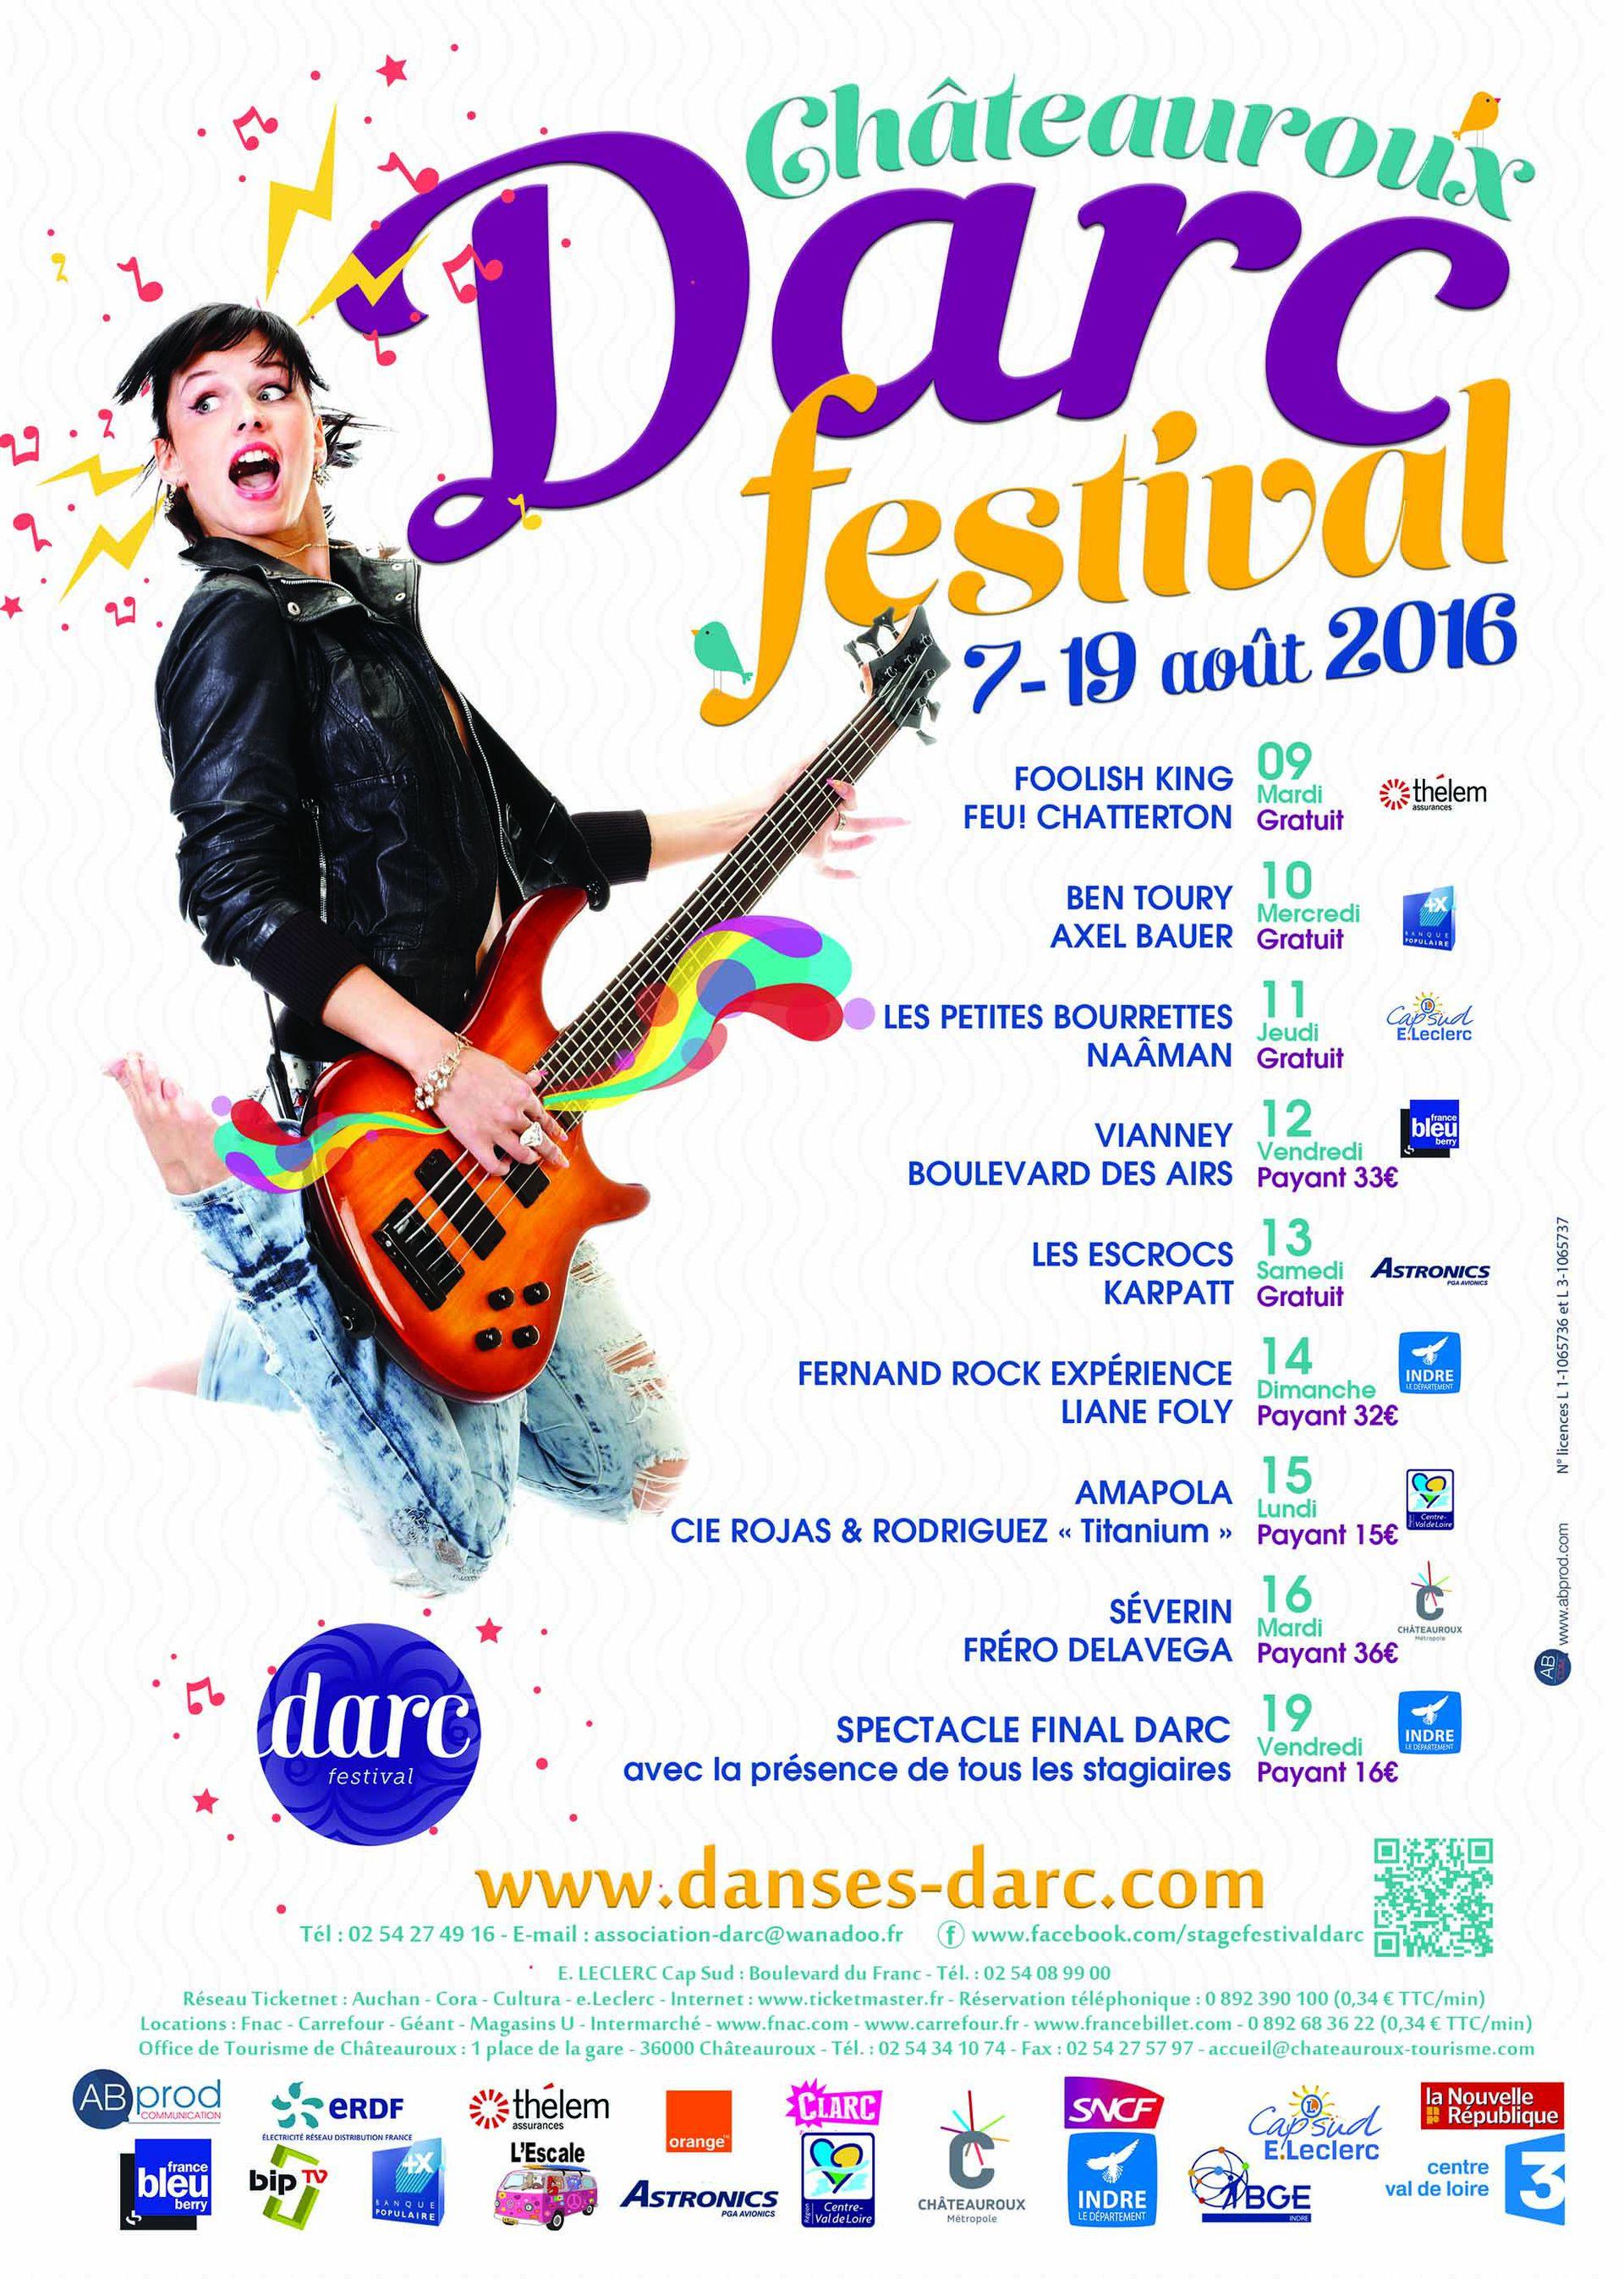 DARC festival